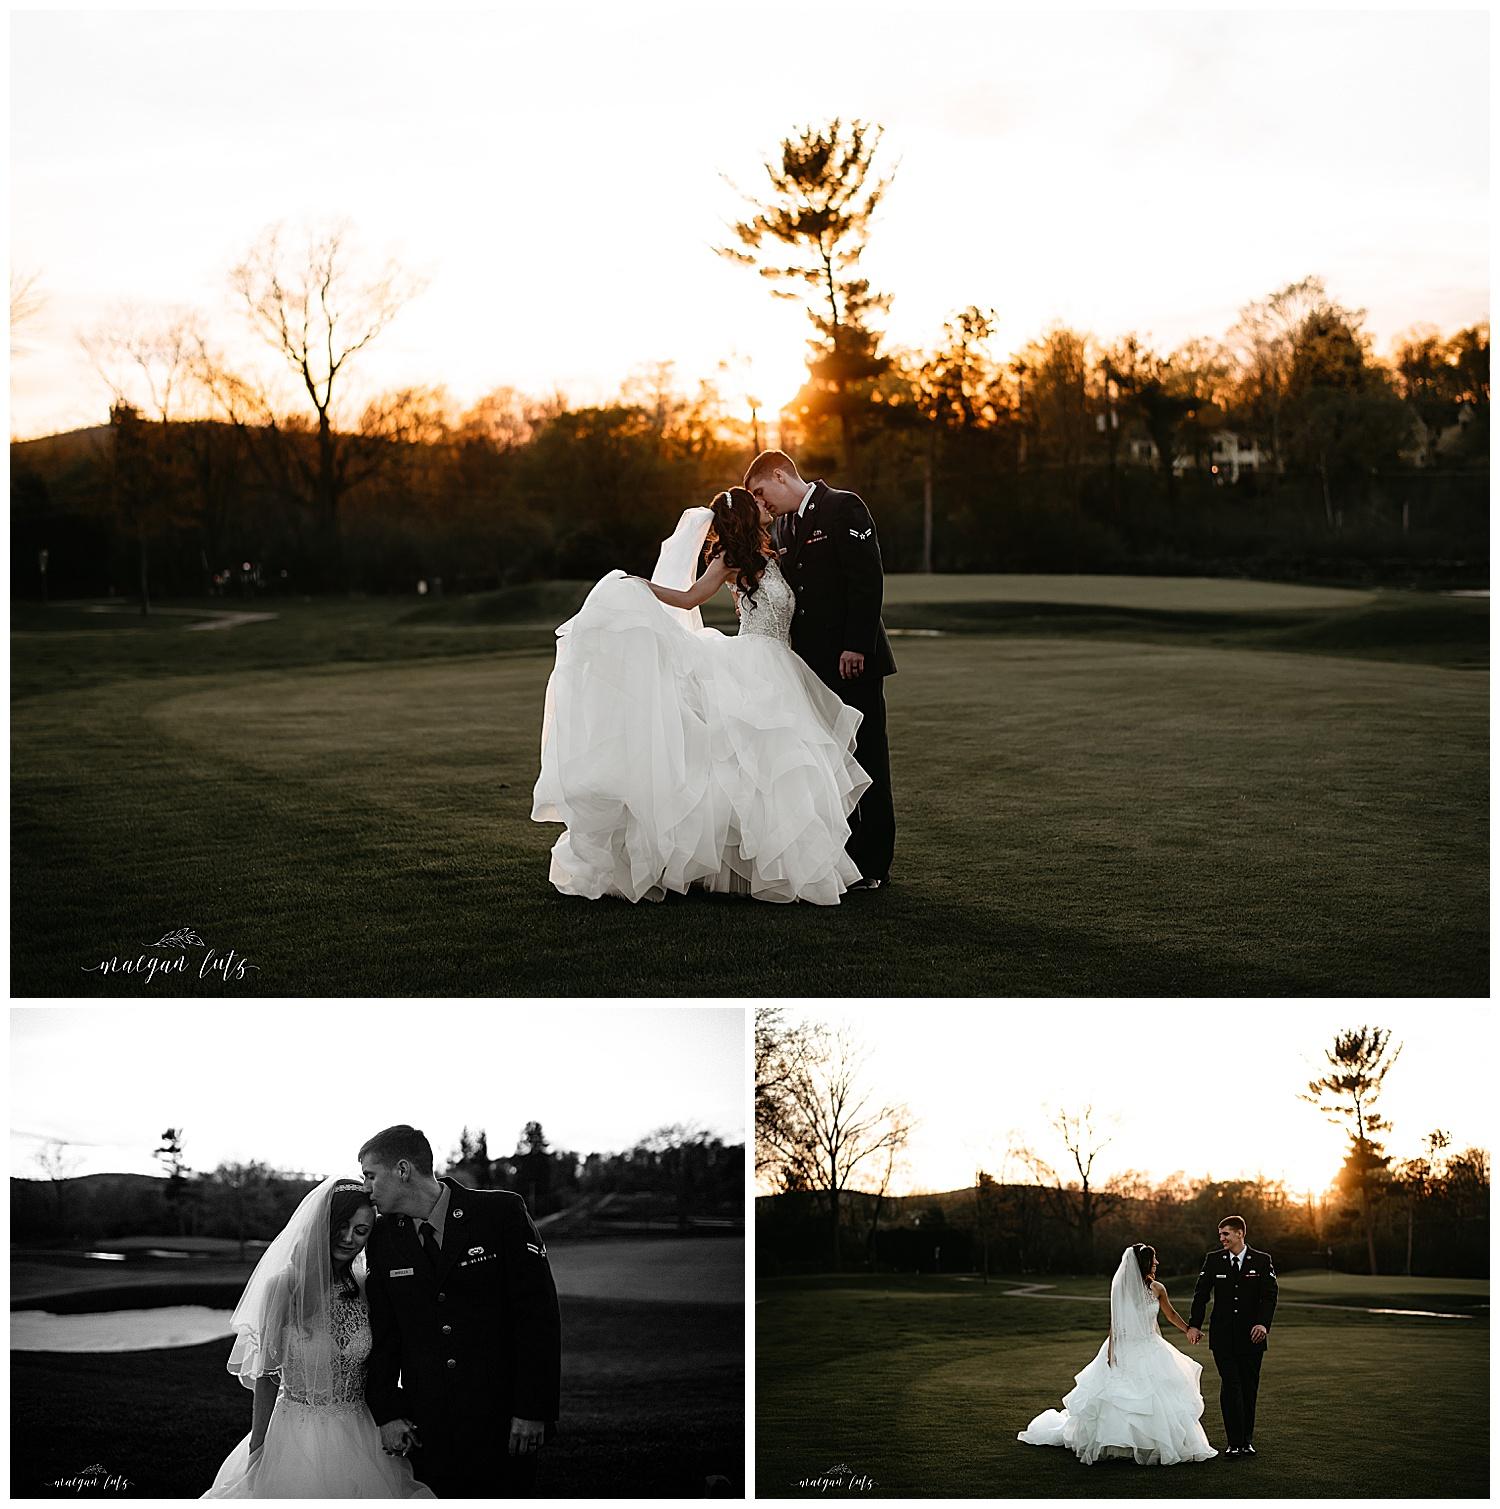 NEPA-Lehigh-Valley-Wedding-Photographer-at-Glen-Oak-Country-Club-Clarks-Summit-PA_0067.jpg